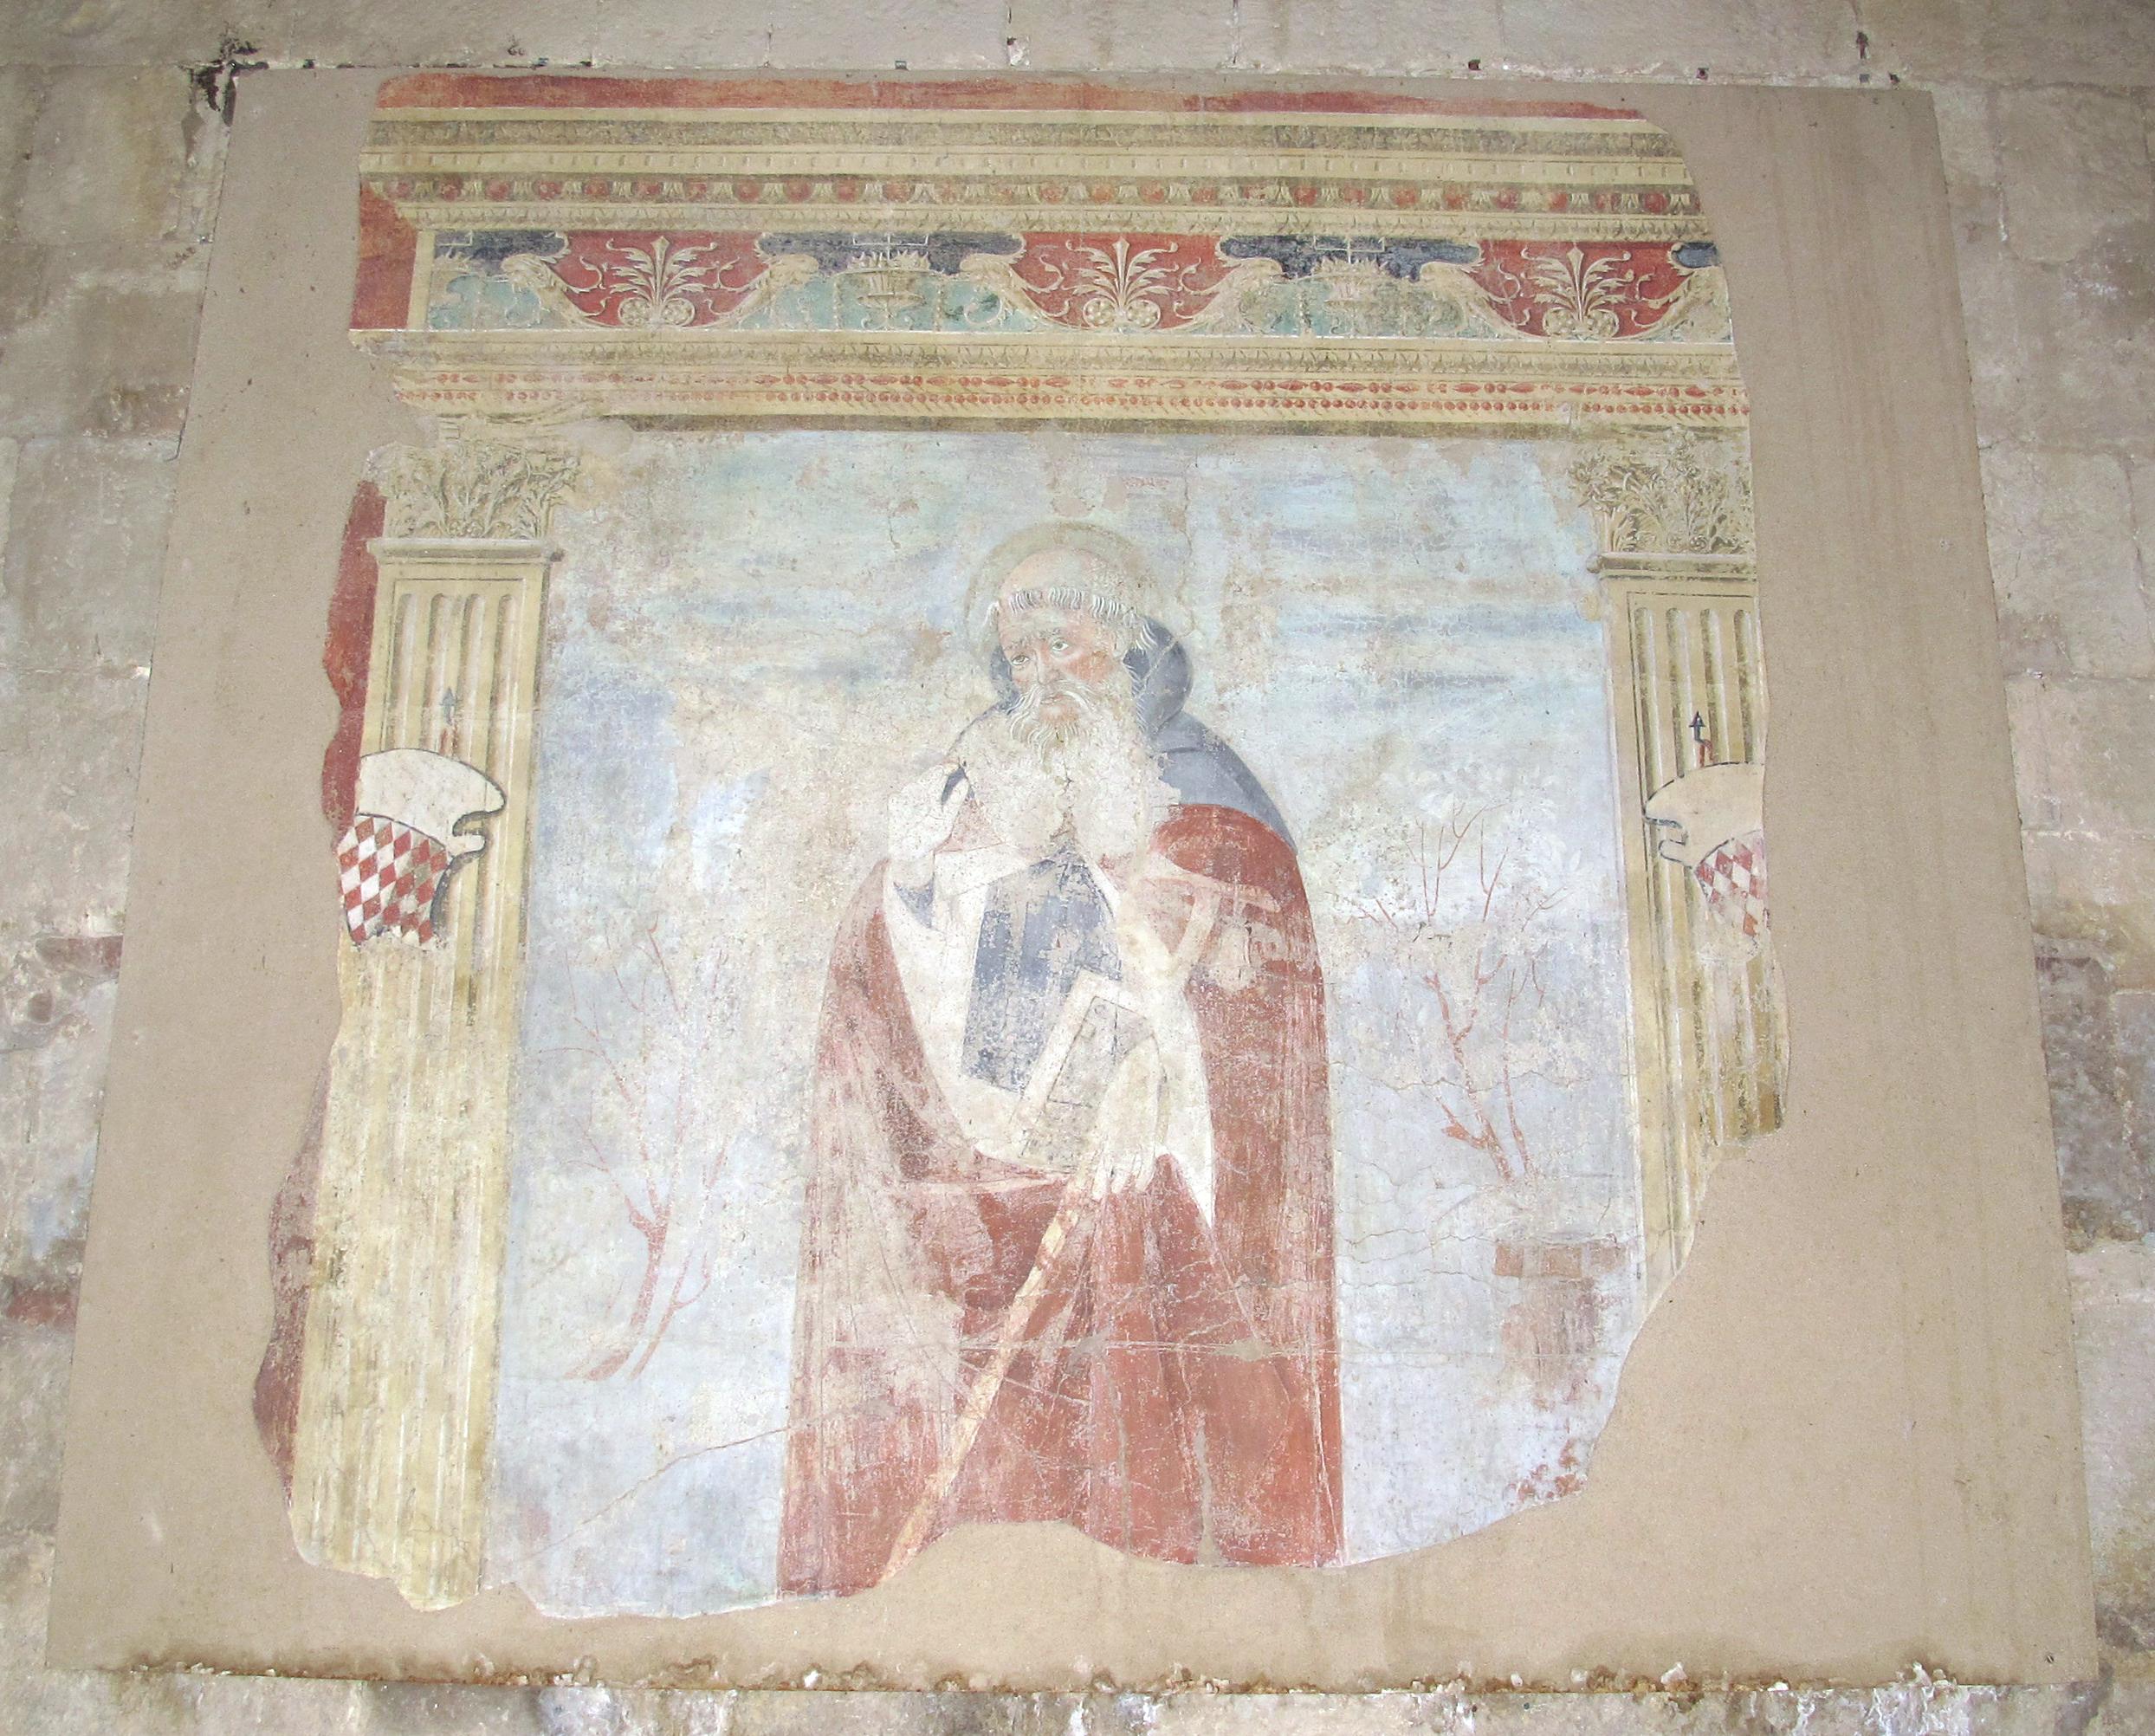 Colle, santa maria in canonica, int. 04 affresco.JPG